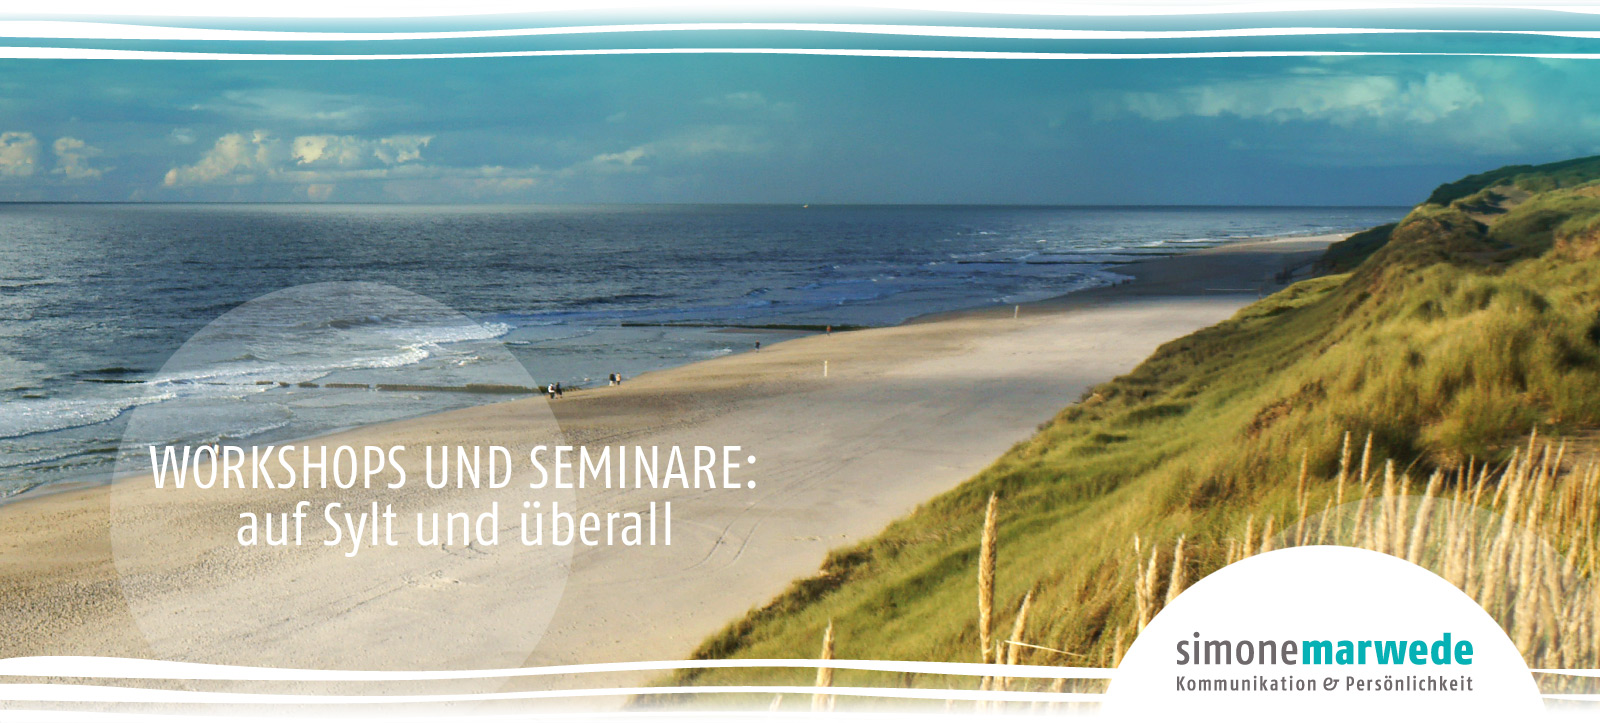 images-simone-marwede-seminare-workshops-logo